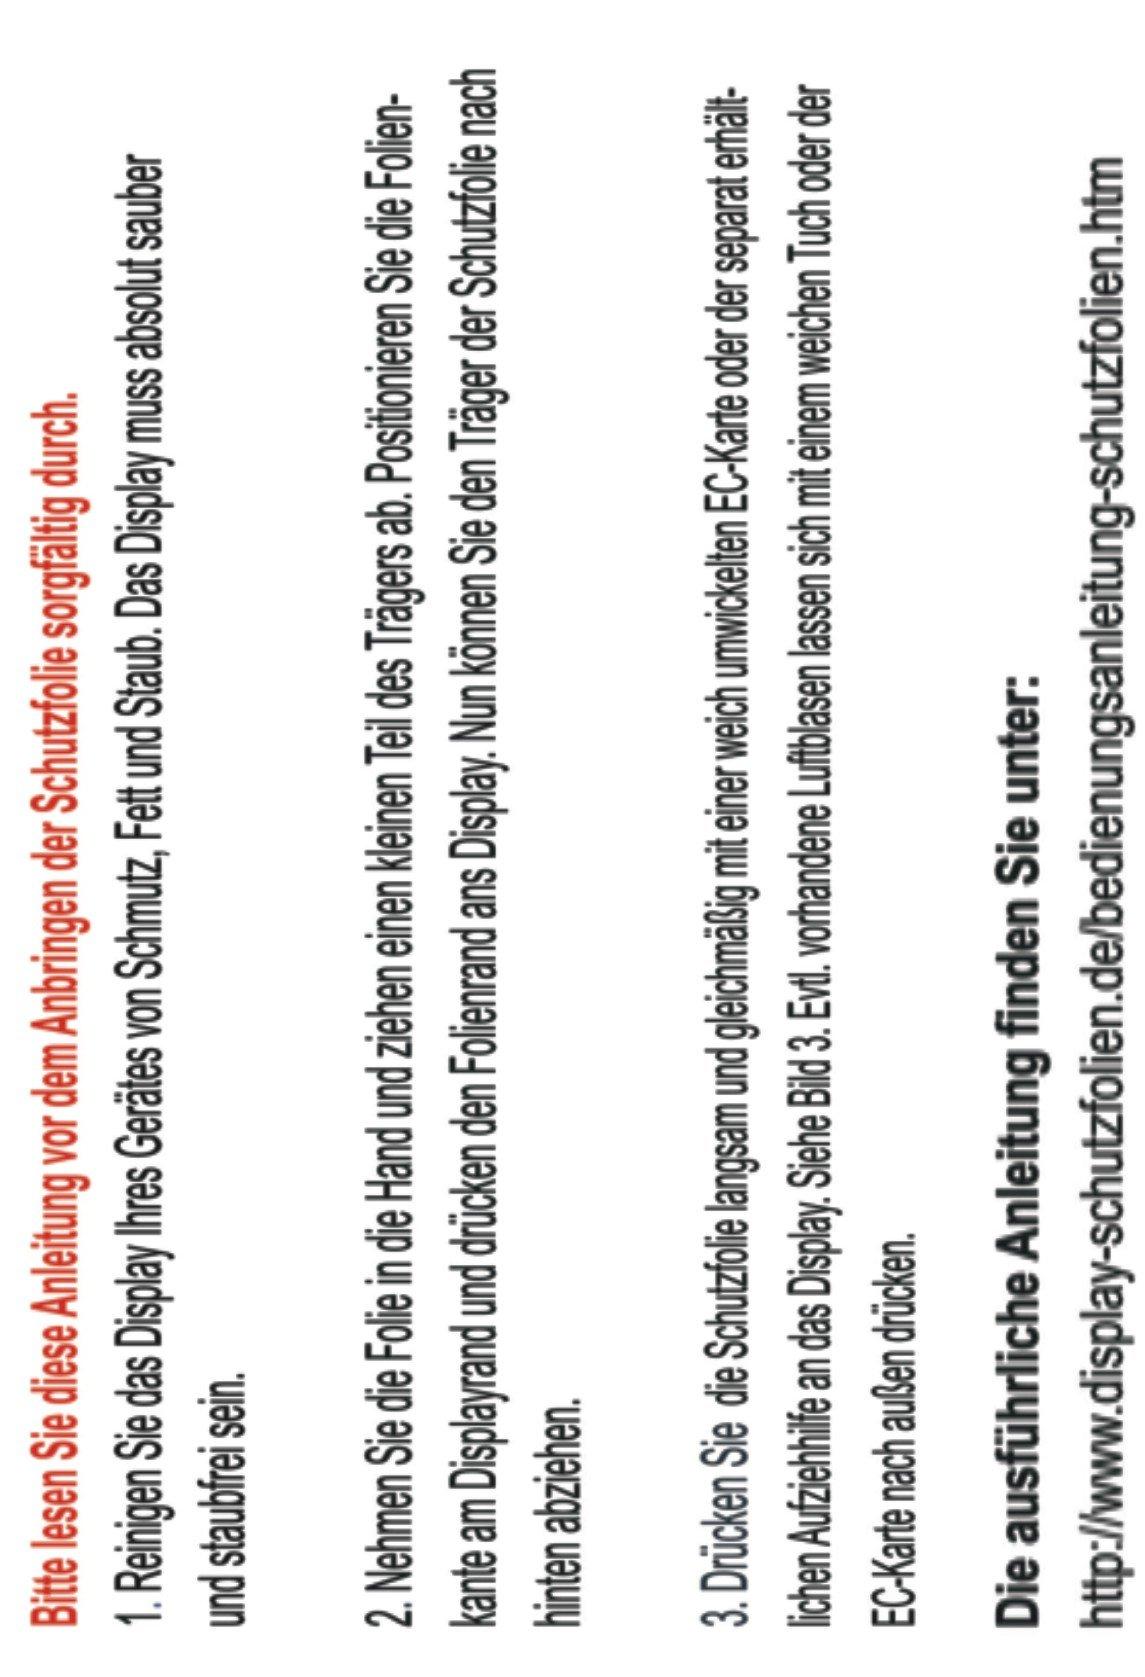 4X-ANTIREFLEX-matt-Schutzfolie-fr-Siemens-TE657509DE-S700-Kaffeevollautomat-Displayschutzfolie-Bildschirmschutzfolie-Schutzhlle-Displayschutz-Displayfolie-Folie